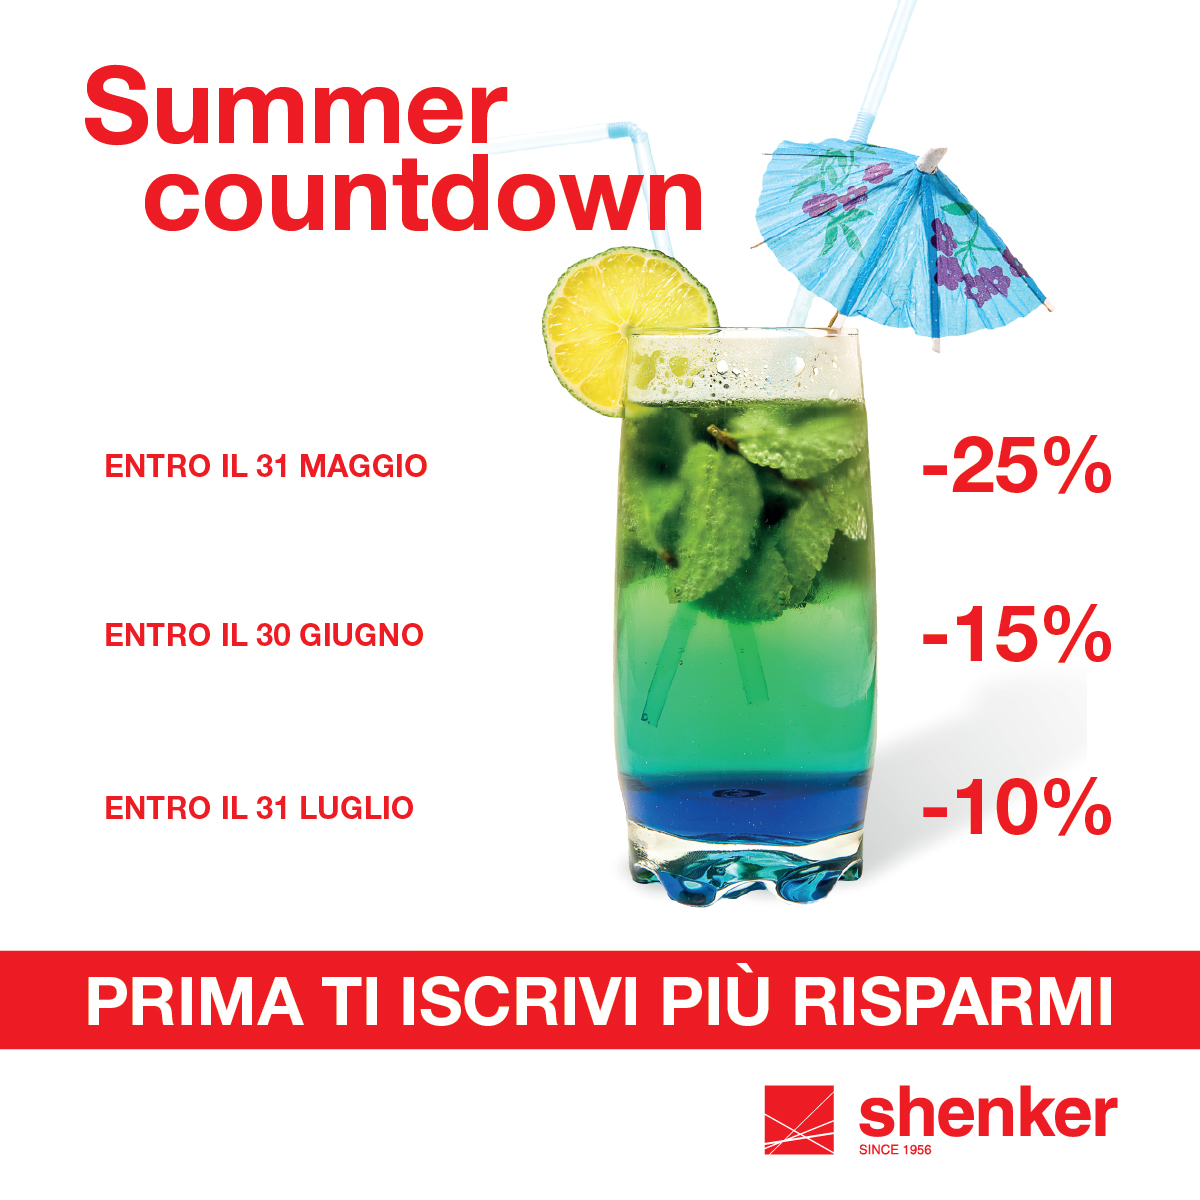 Summer Countdown 2019